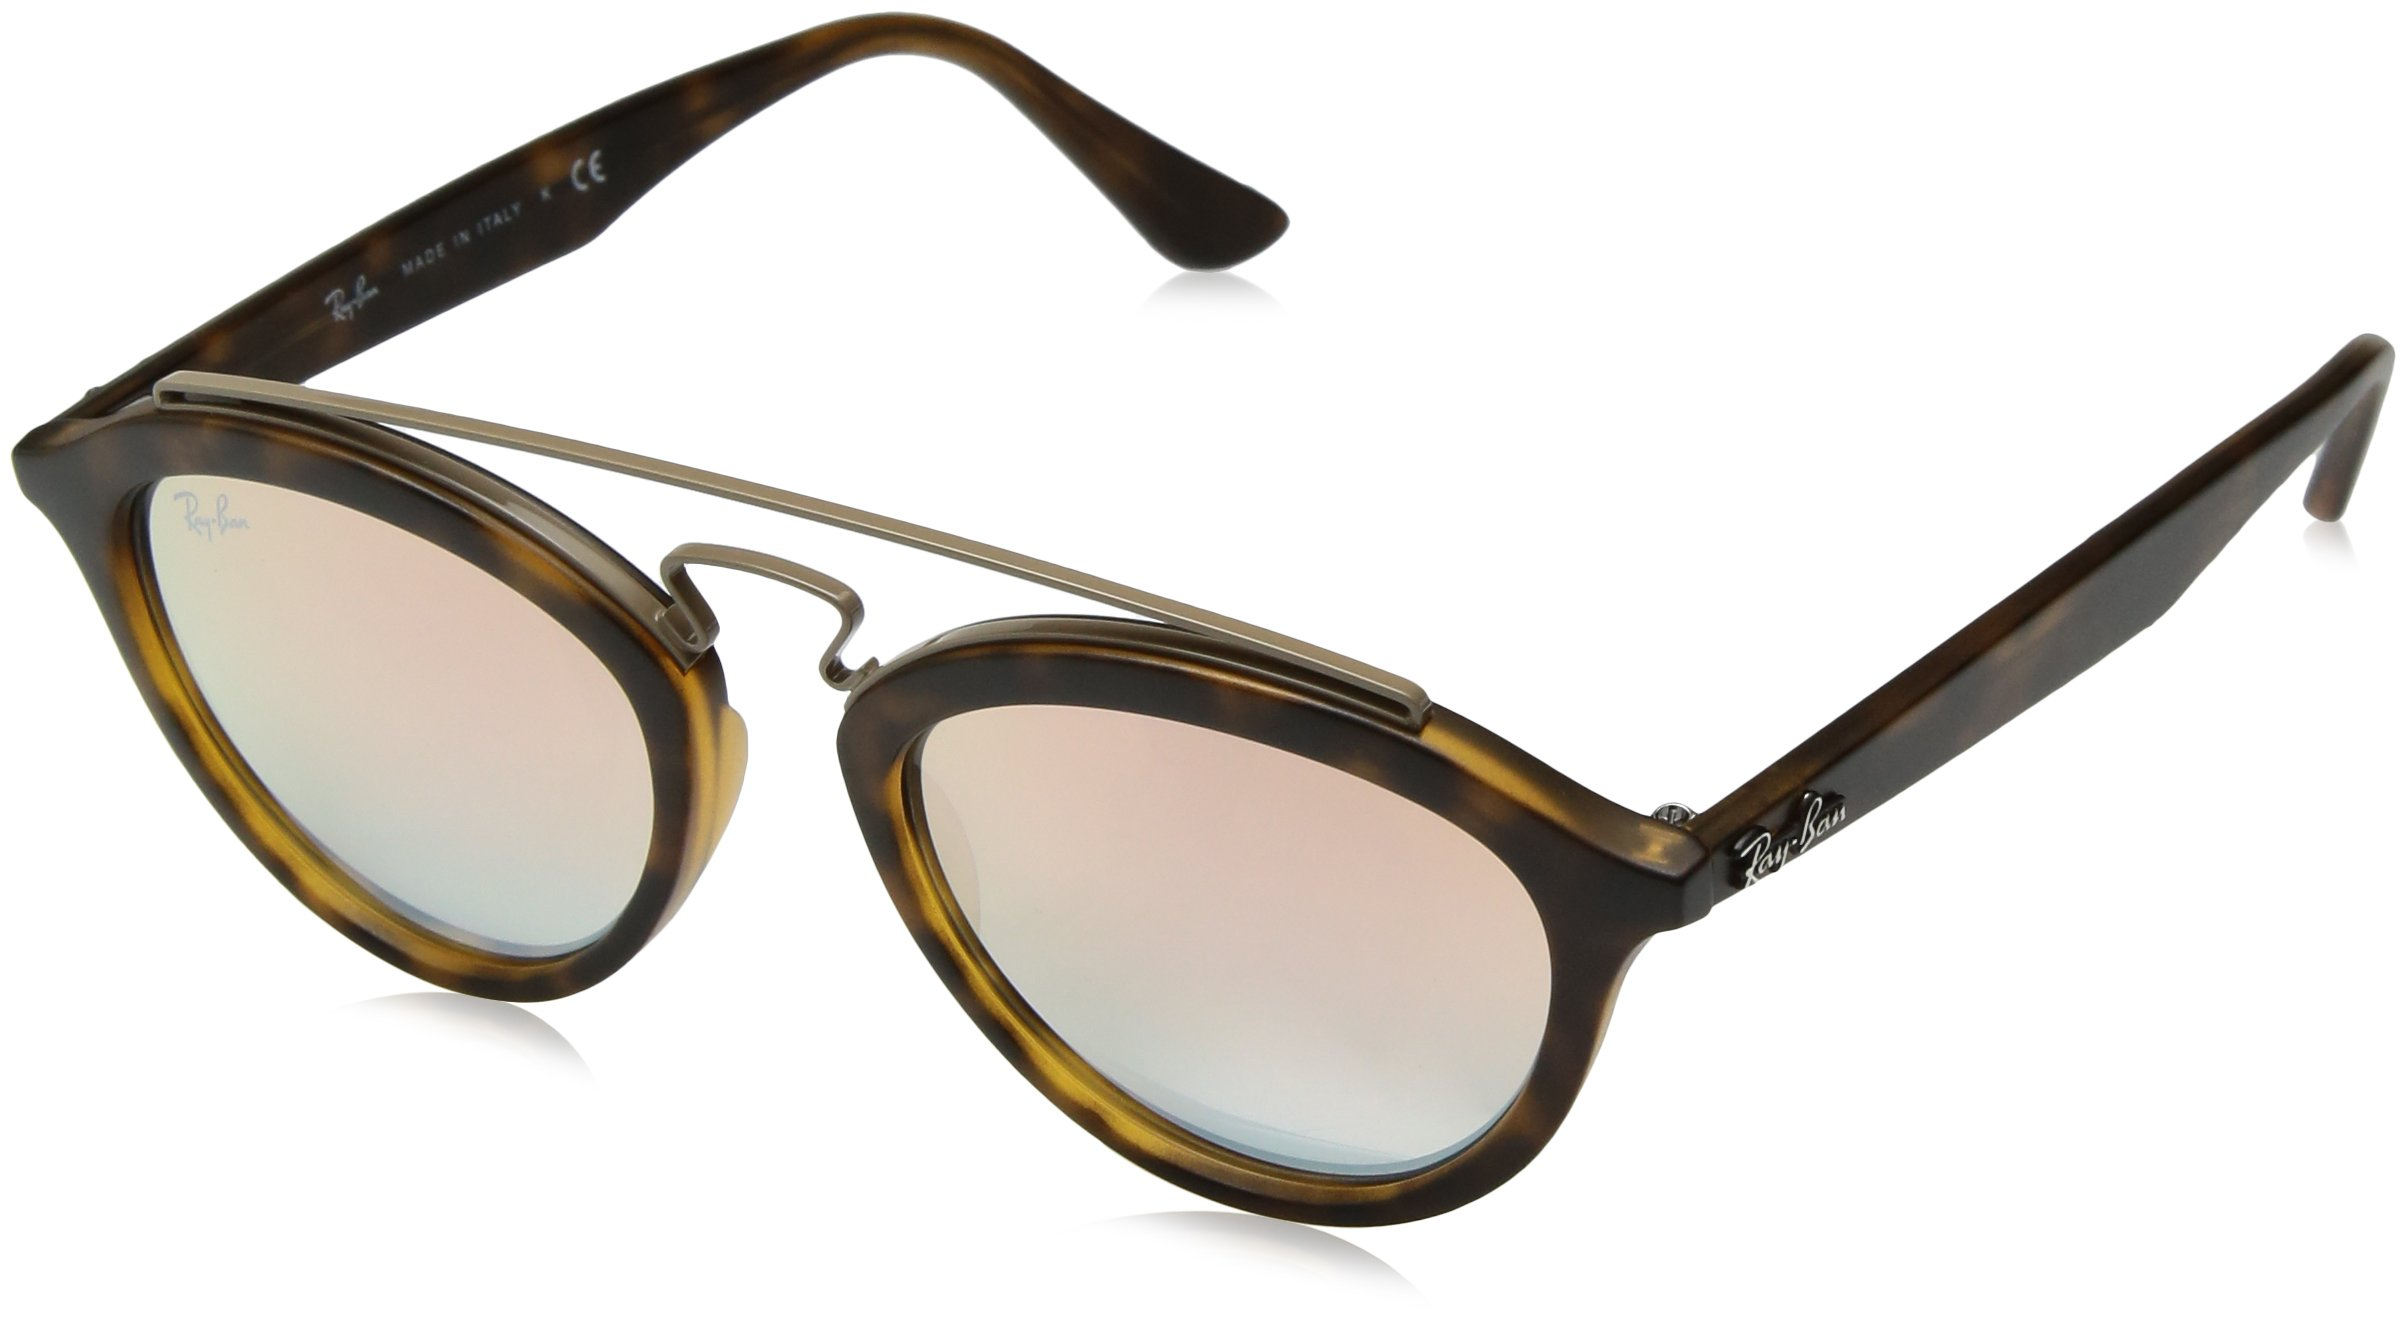 Ray-Ban Women's Gatsby II RB4257 6267B9 Non-Polarized Sunglasses, Matte Havana/Copper Gradient Mirror, 50 mm